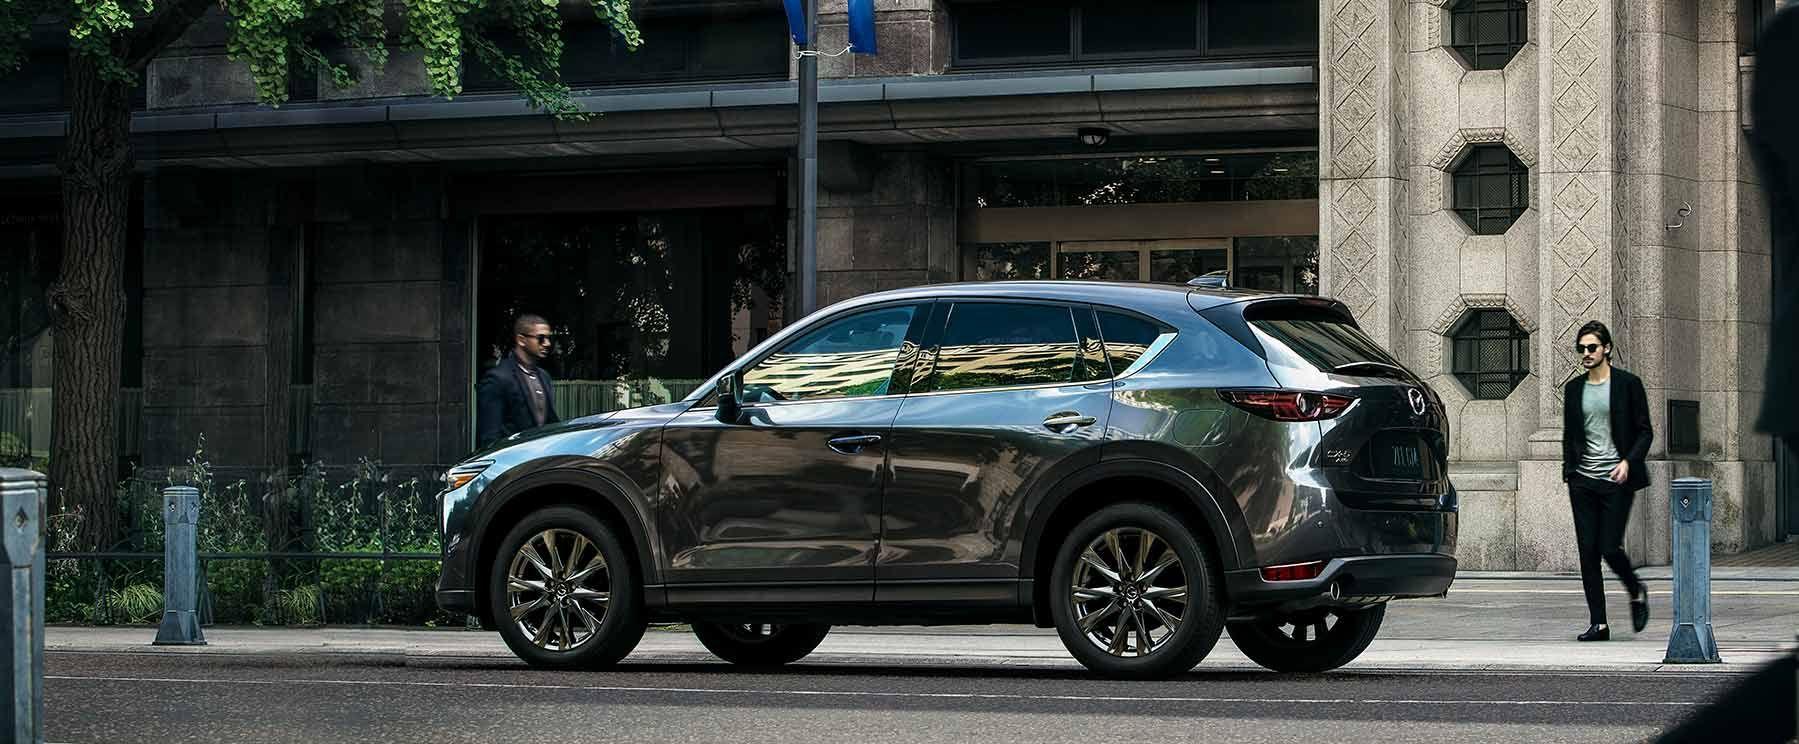 2019 Mazda CX-5 Financing near College Station, TX